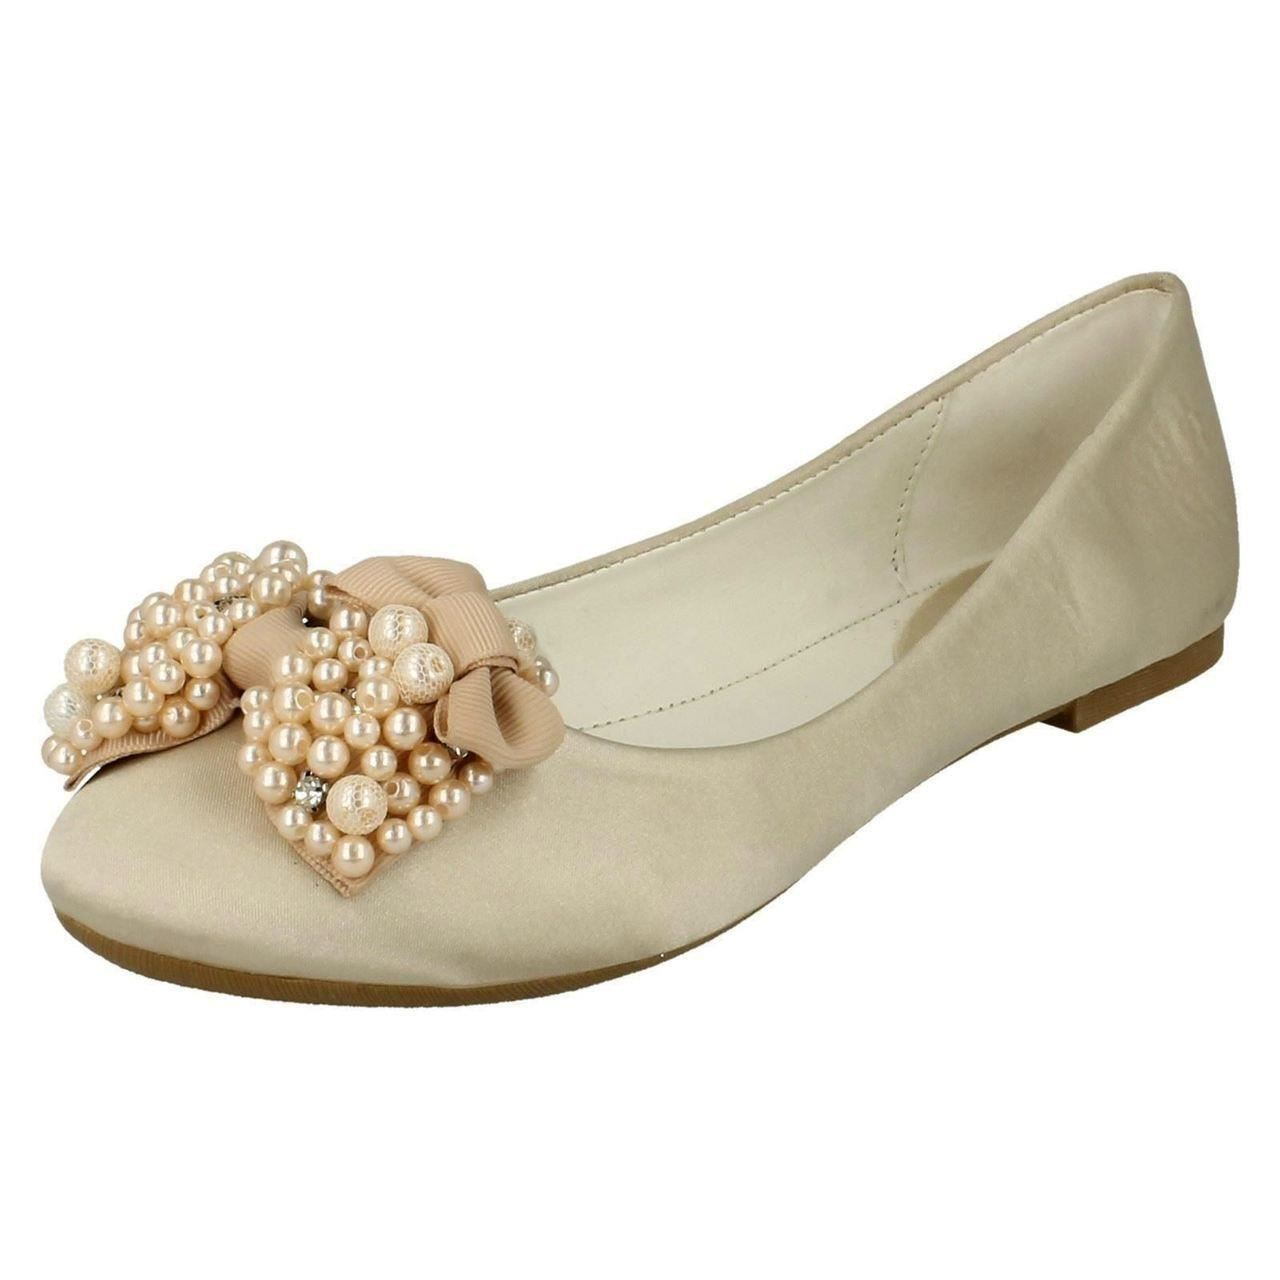 Ladies-Spot-On-F80090-Evening-Ballerina-Shoes-Style-K